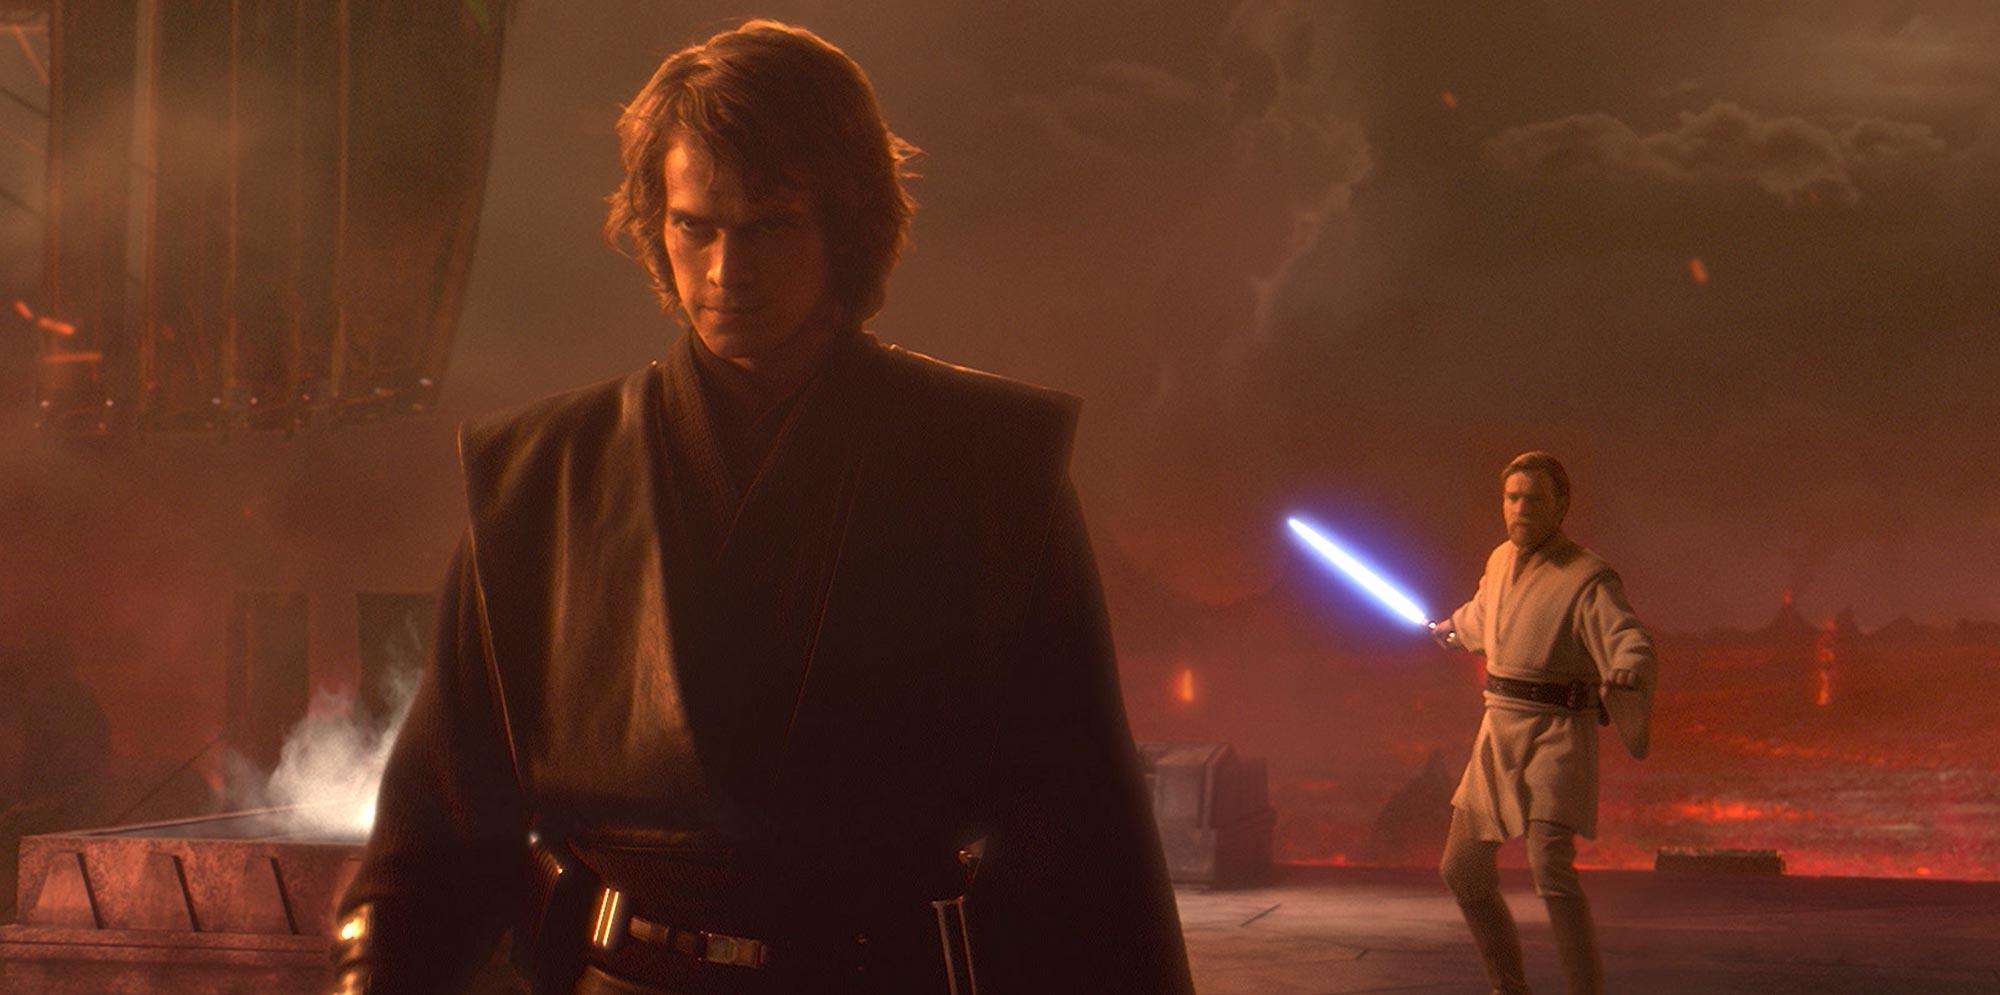 Star Wars Ranking Star Wars: Revenge of the Sith